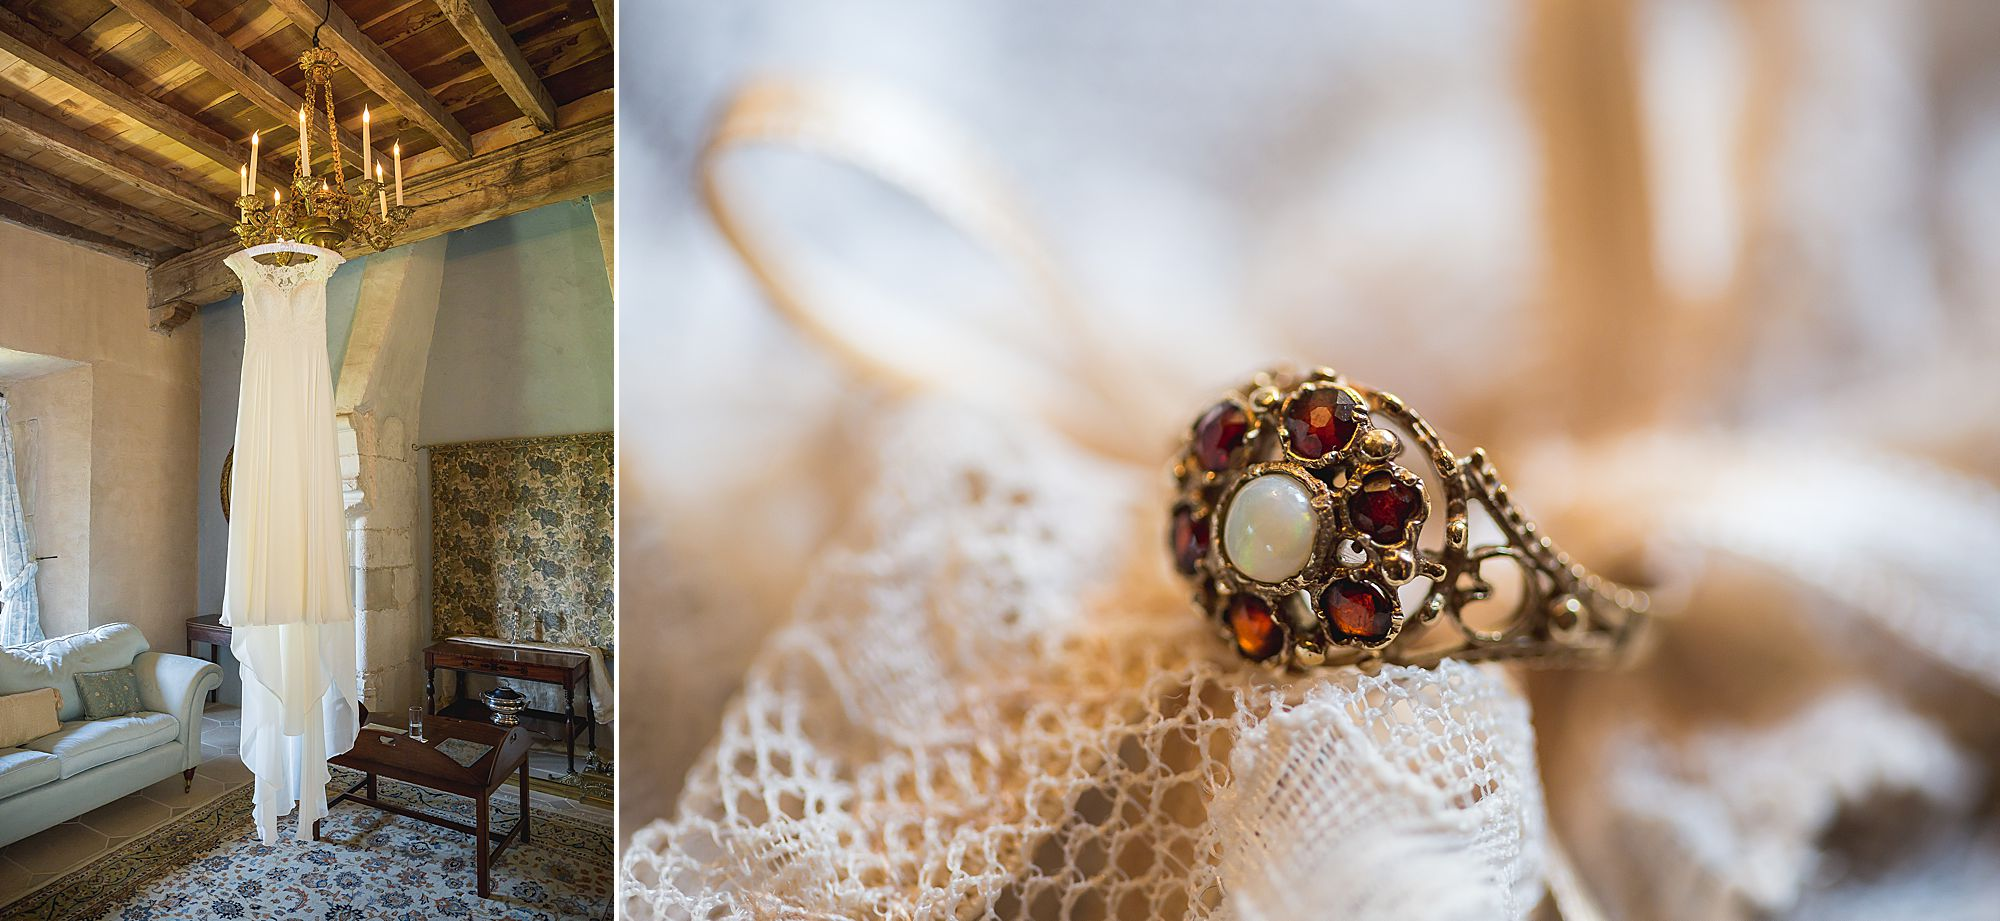 Brides dress hanging up at Chateau Brametourte wedding